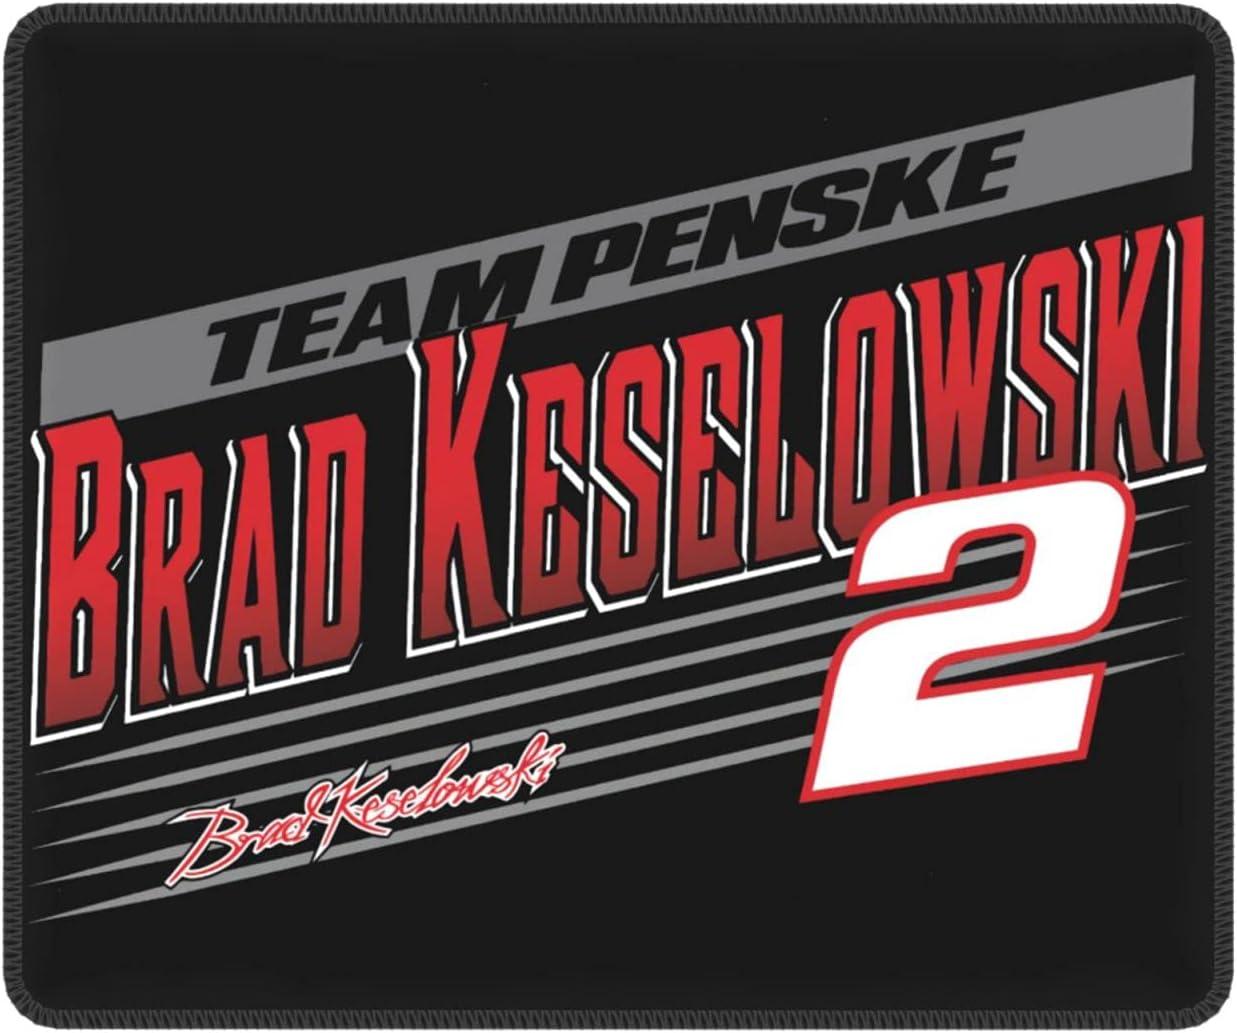 5 popular New sales Brad Keselowski Mouse Pad with Rubber Base Premium-Tex Non-Slip